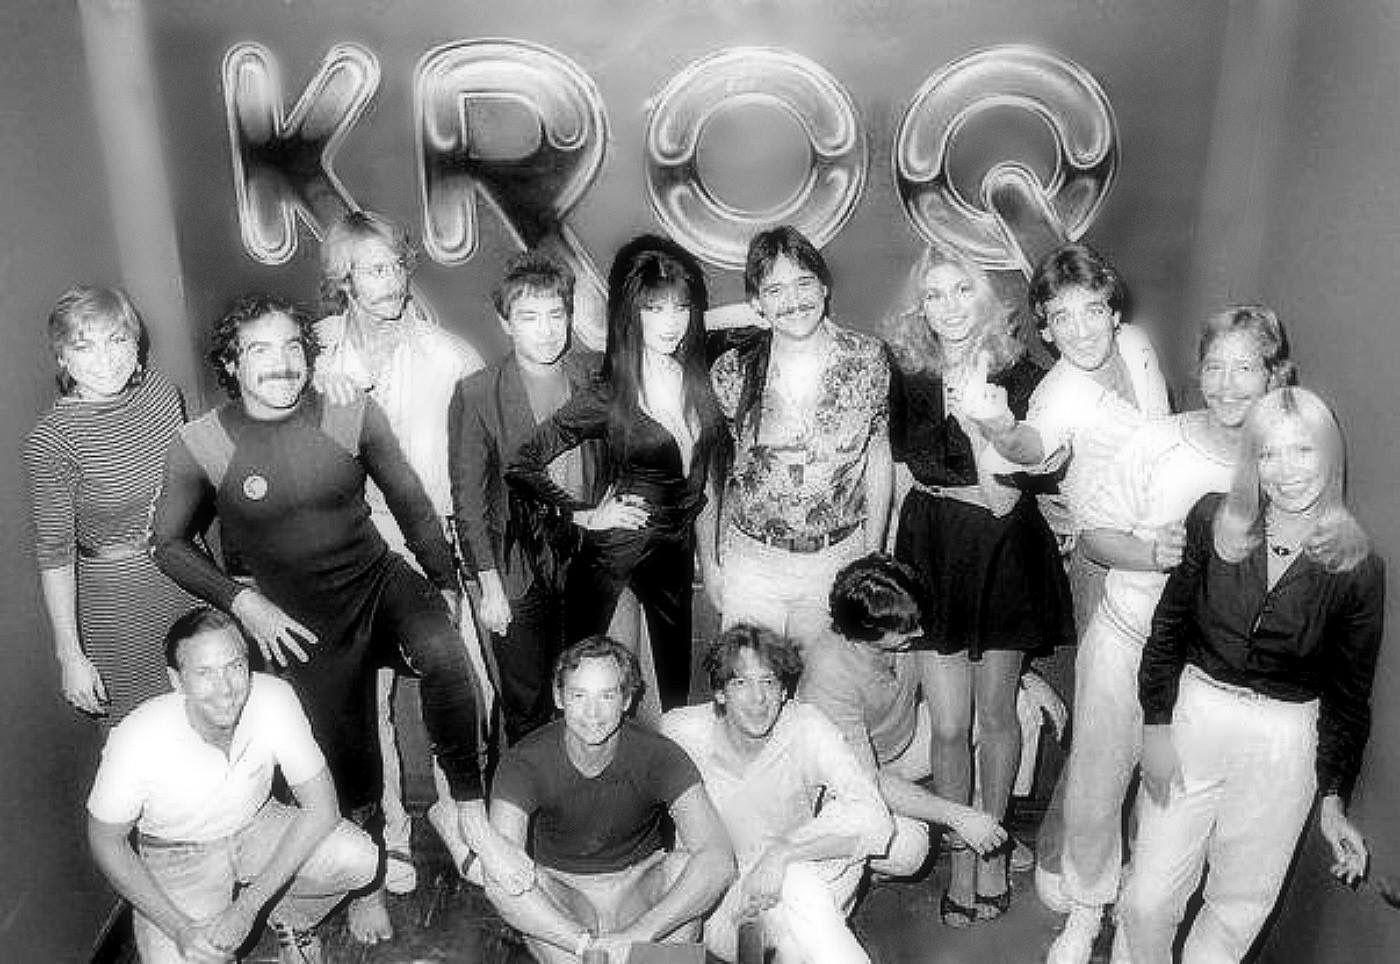 Pasadena 39 s 1980 39 s radio station kroq crew with elvira for The fish radio station